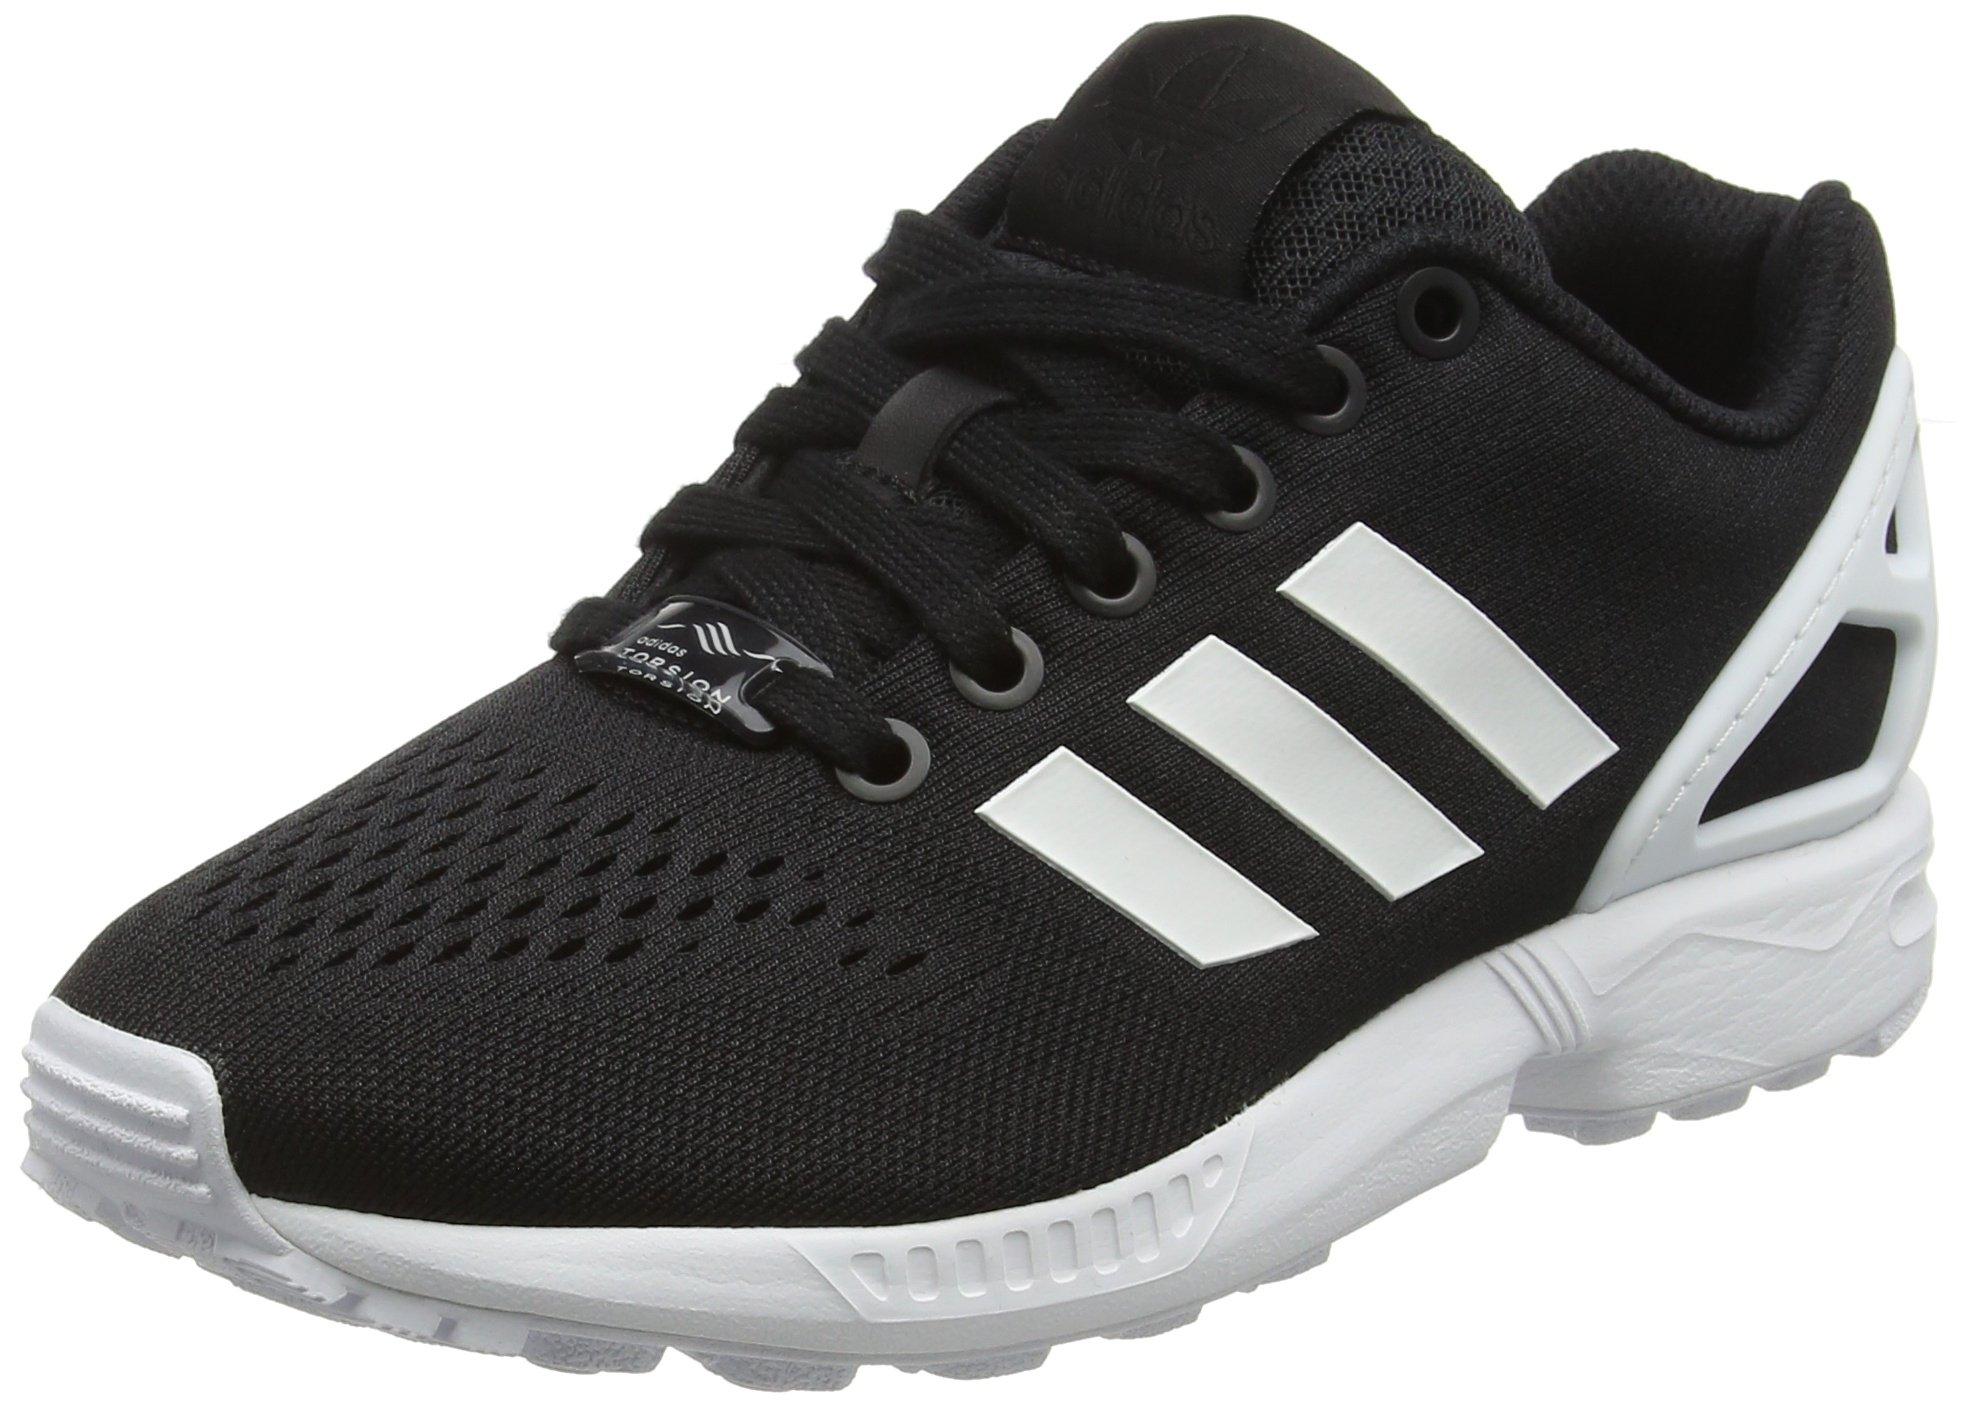 adidas Unisex Adults' Zx Flux Em Low-Top Sneakers- Buy Online in ...